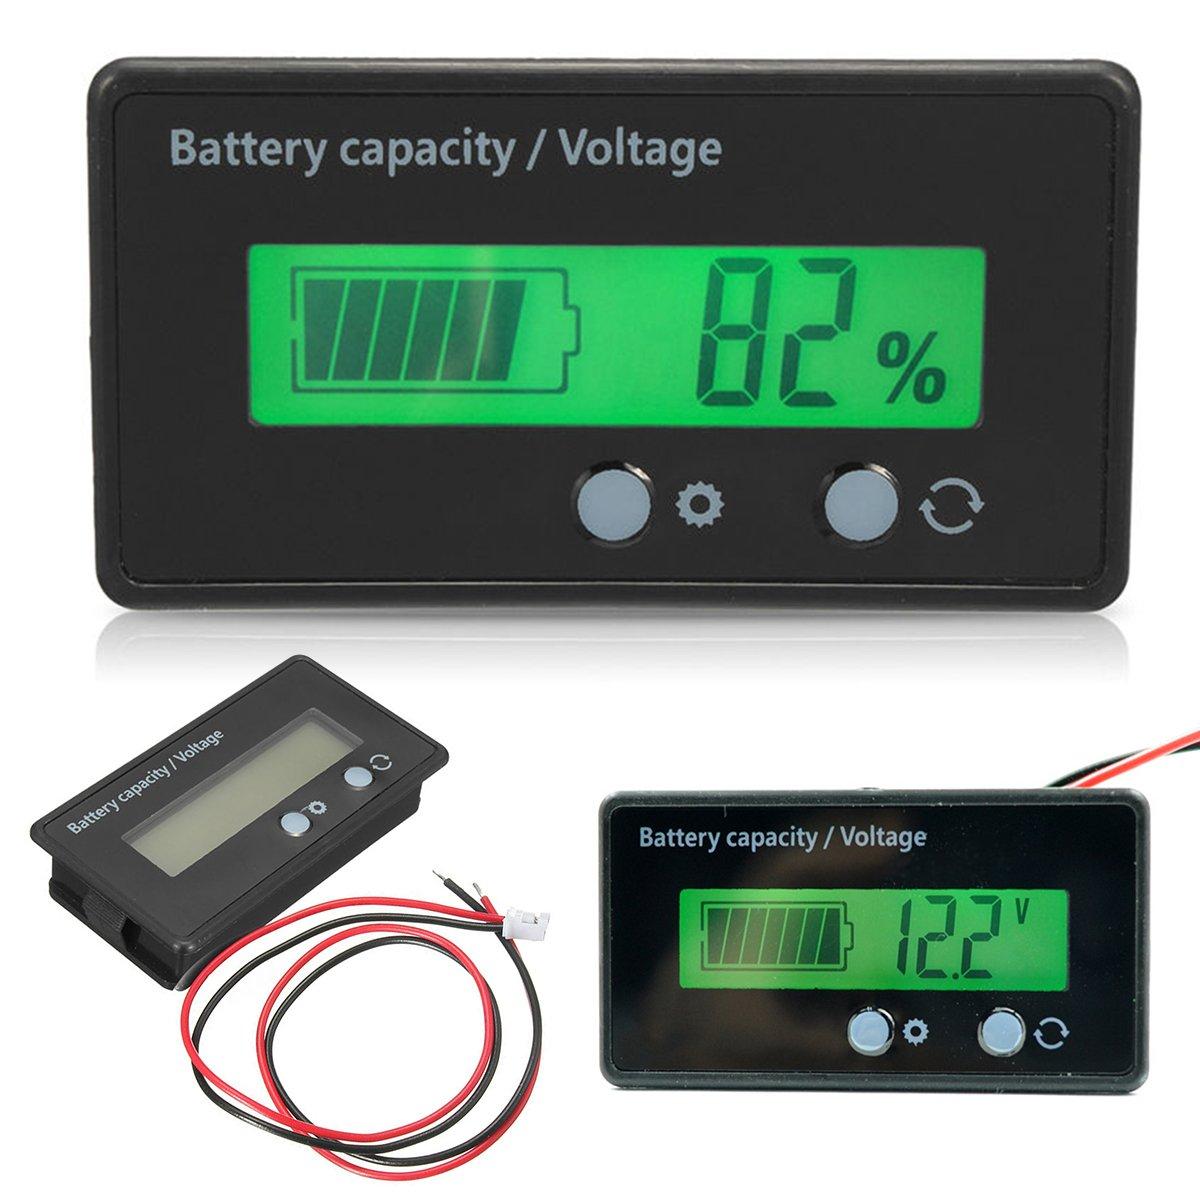 Zerone Digital-Multimeter, LCD-Anzeige Batteriekapazitä t Voltmeter Meter Monitor 6-70V Multifunktions-Meter Batterieanzeige Monitor-Modul Elektrische Menge Detector Reader fü r Auto-Fahrzeug